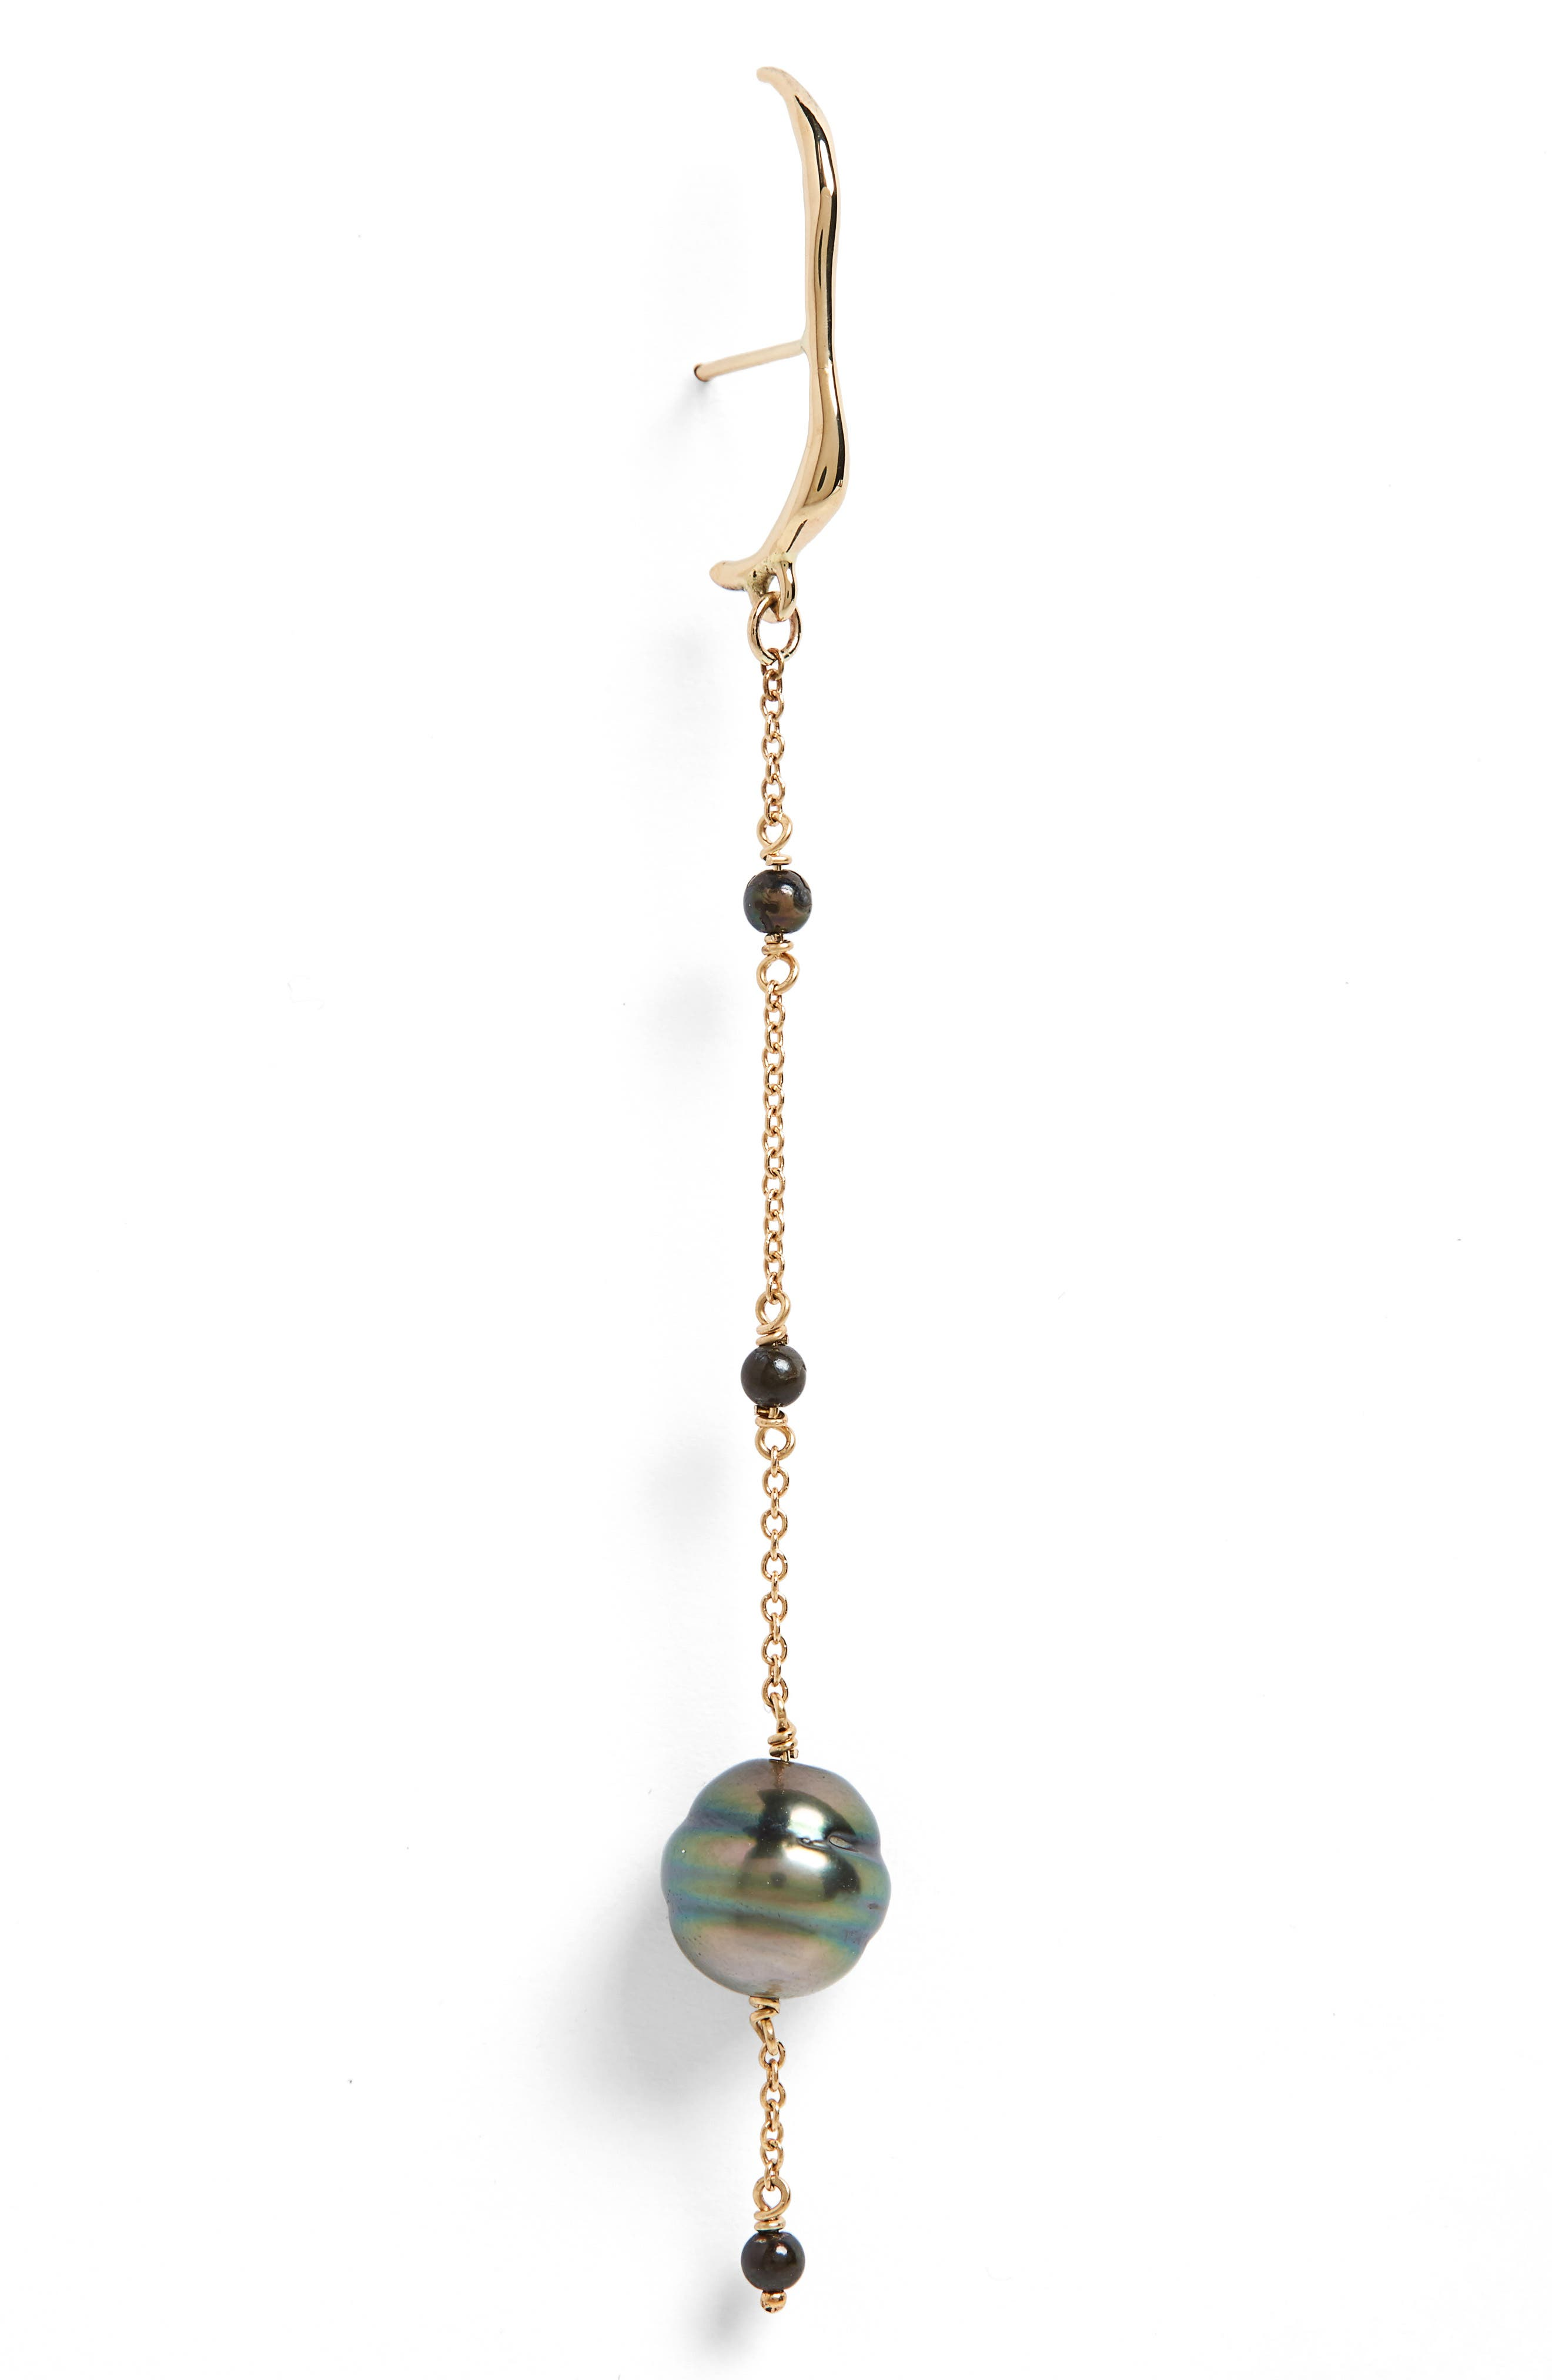 Aura Cultured Pearl Drop Earrings,                             Alternate thumbnail 3, color,                             Gold/ Black Pearl